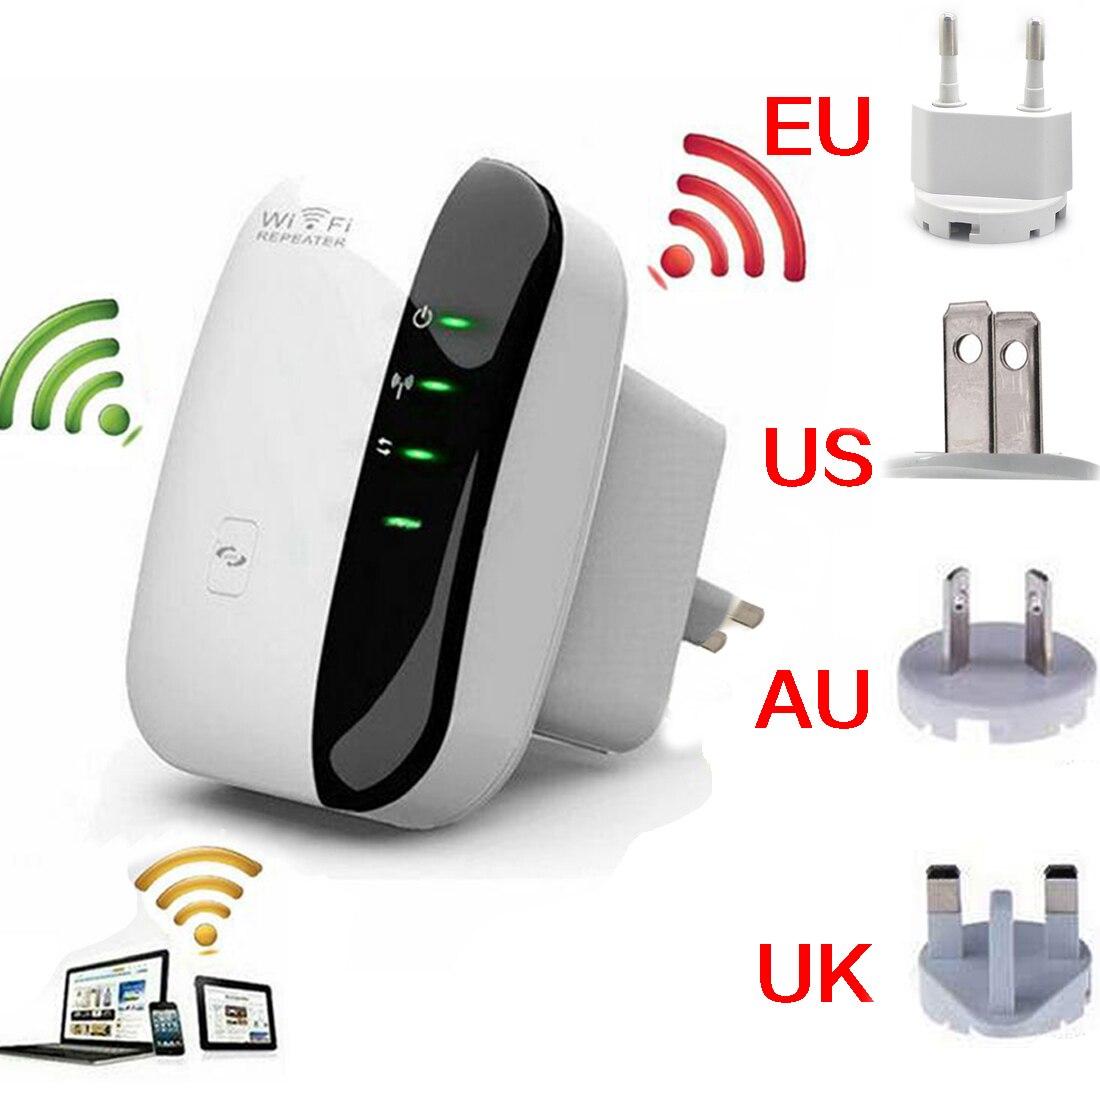 NOYOKERE Wireless-N Wifi repetidor 802.11n/b/g Red Wi Fi enrutadores 300 Mbps rango expansor señal Booster WIFI Ap Wps cifrado